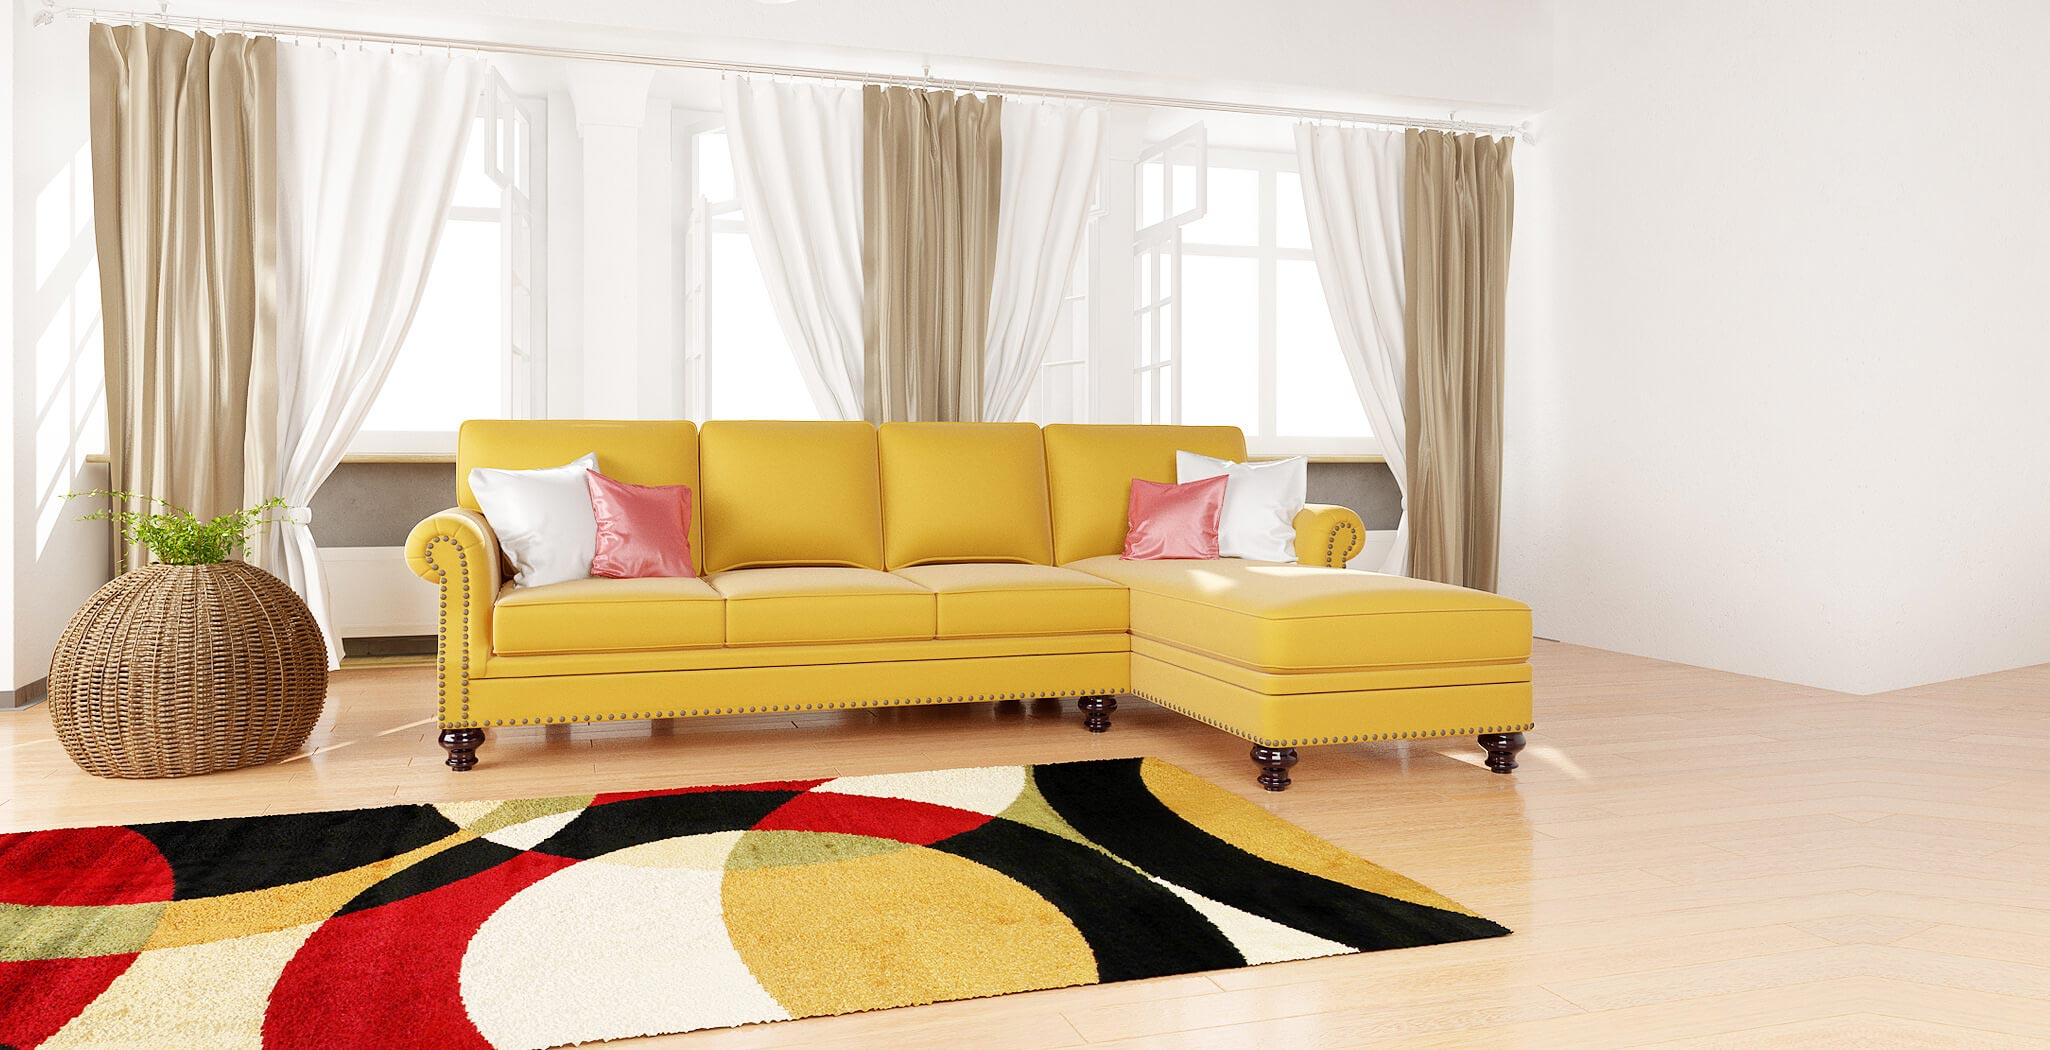 rotterdam panel furniture gallery 5